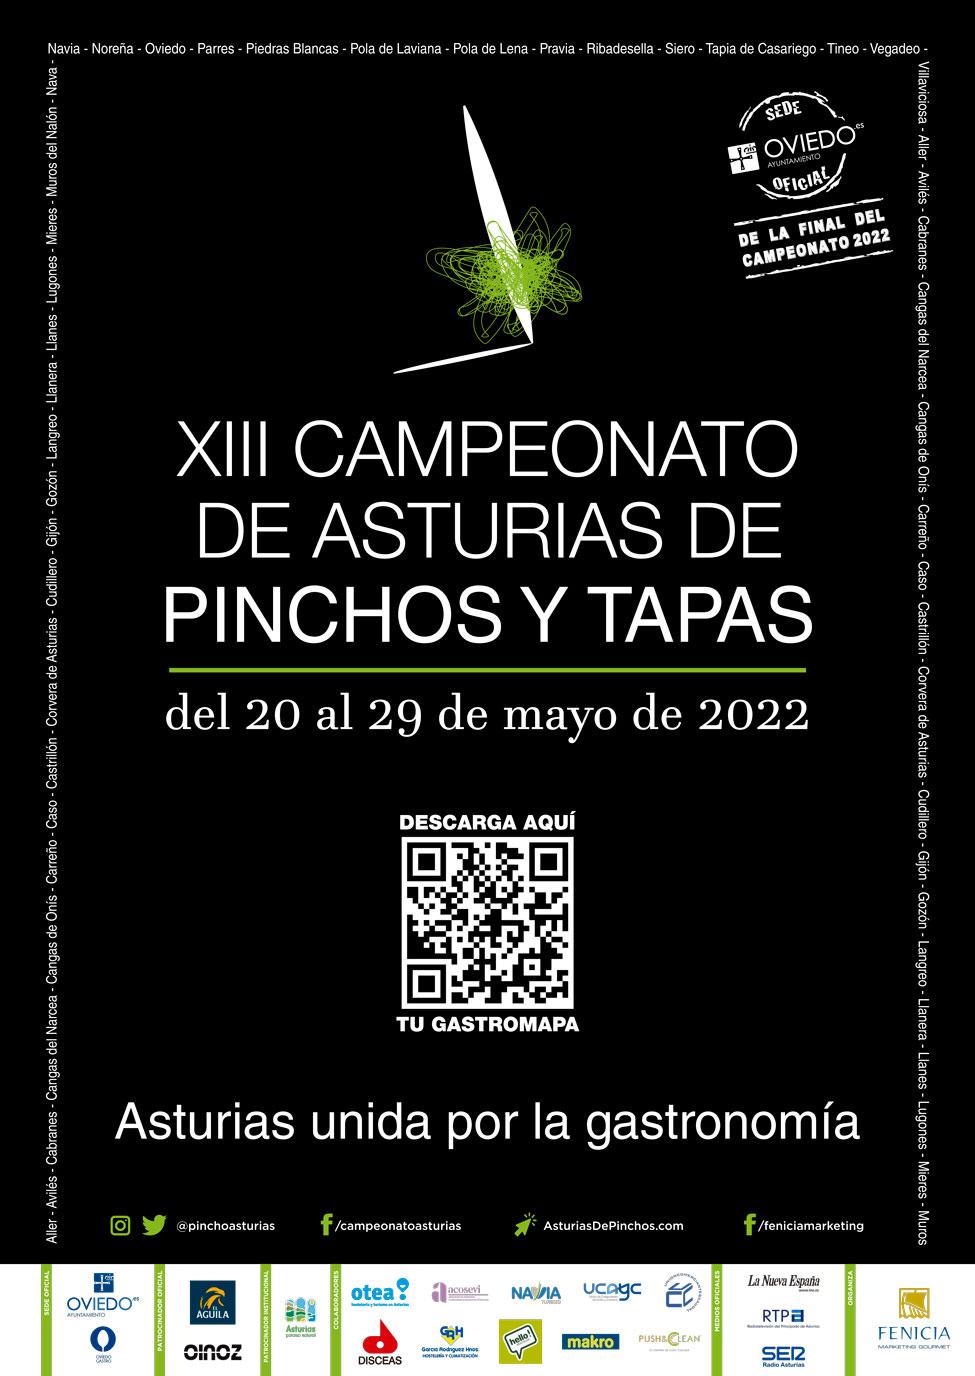 http://mas.lne.es/concursos/pinchos-tapas-asturias/img/cartel.jpg